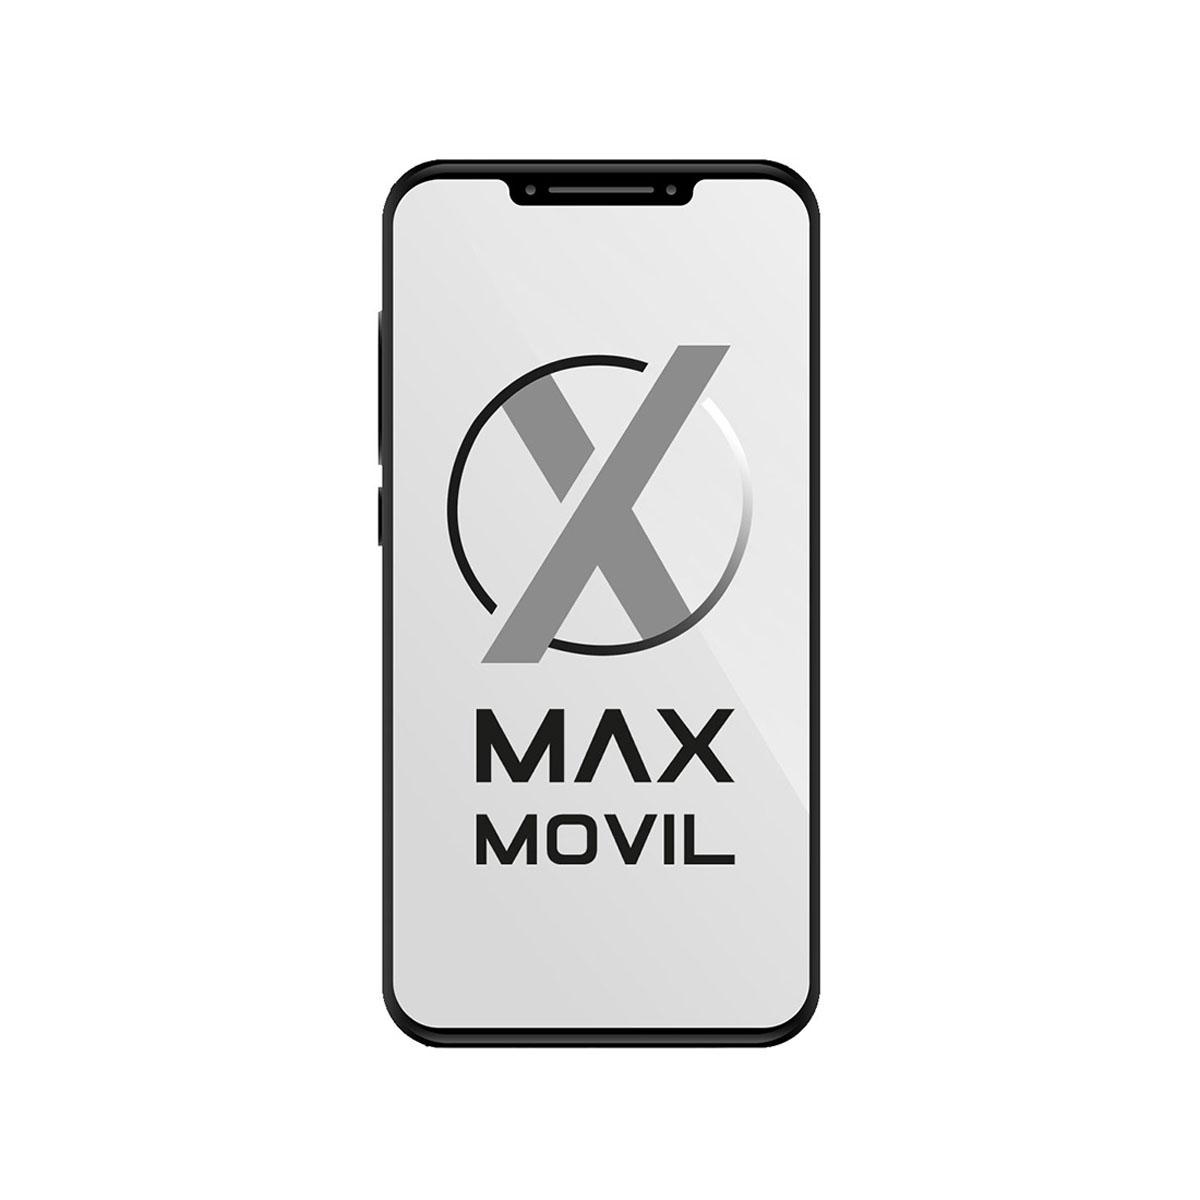 Sandisk USB + tarjeta micro SD 32GB para móviles y tablets Android